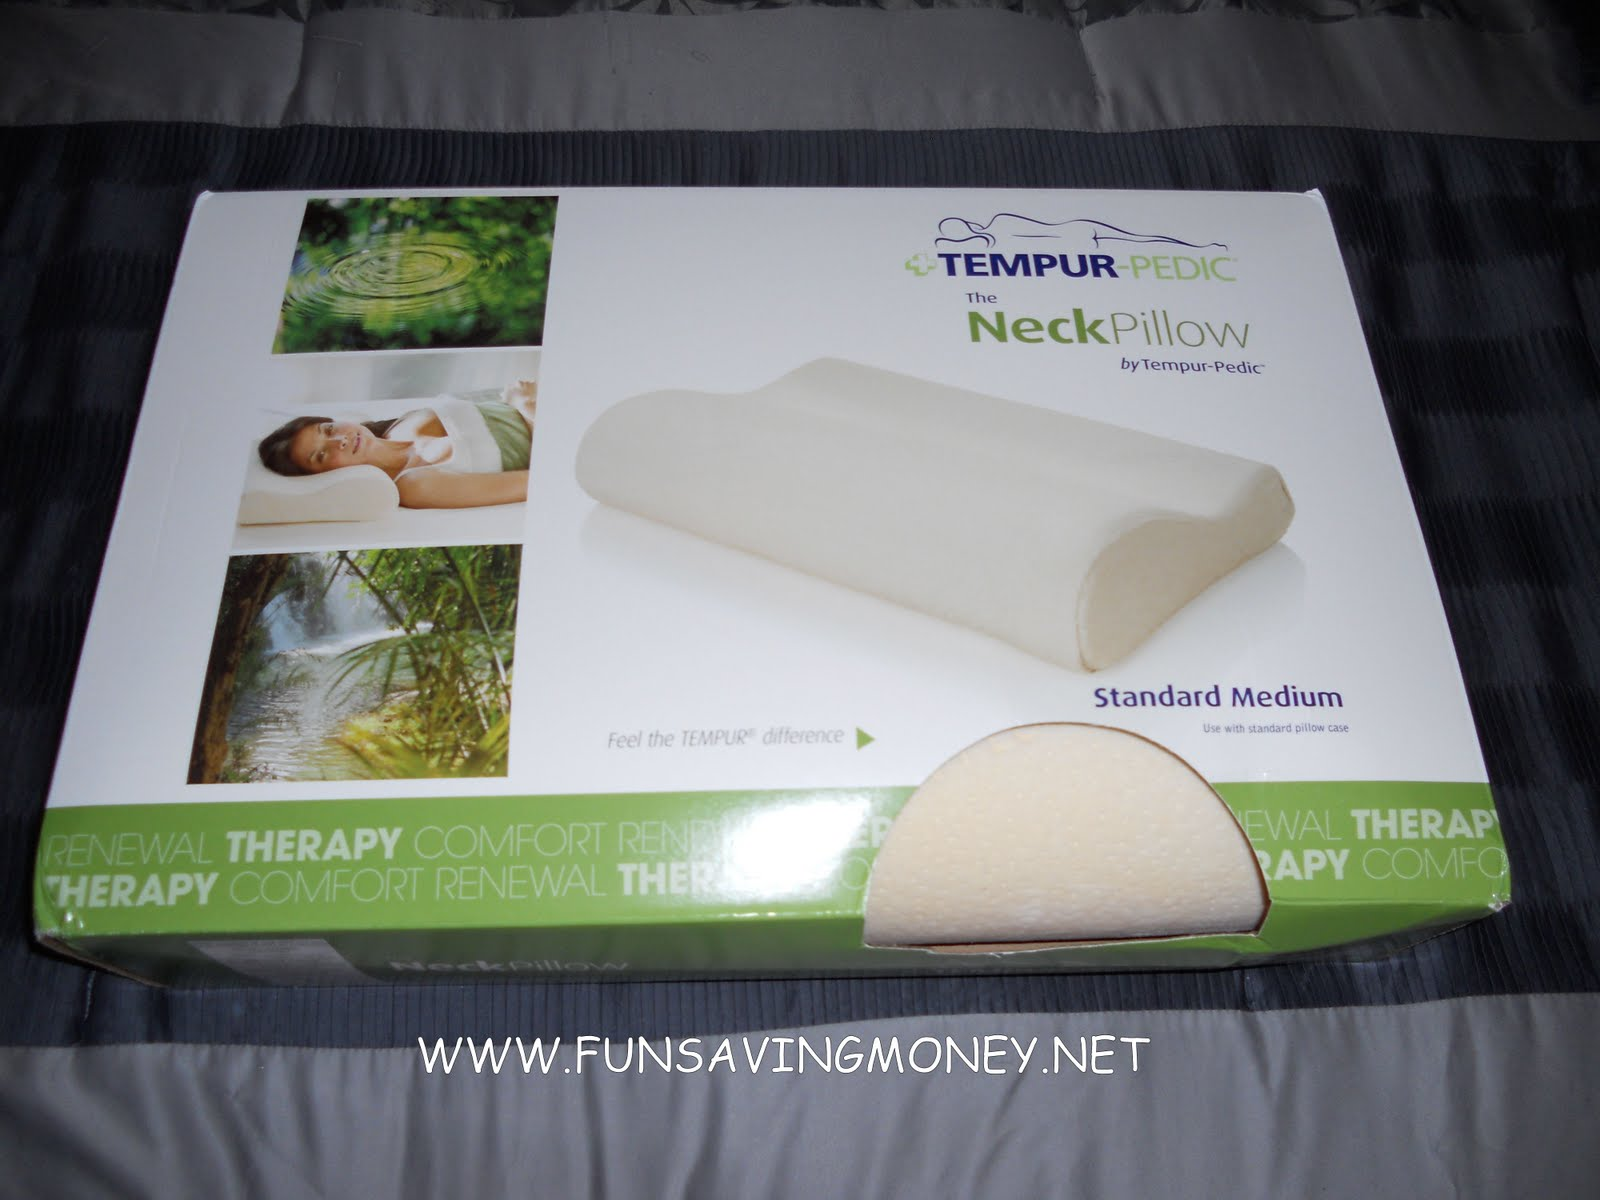 Sleepys TempurPedic Medium Neck Pillow Review and Giveaway  Fun Saving Money